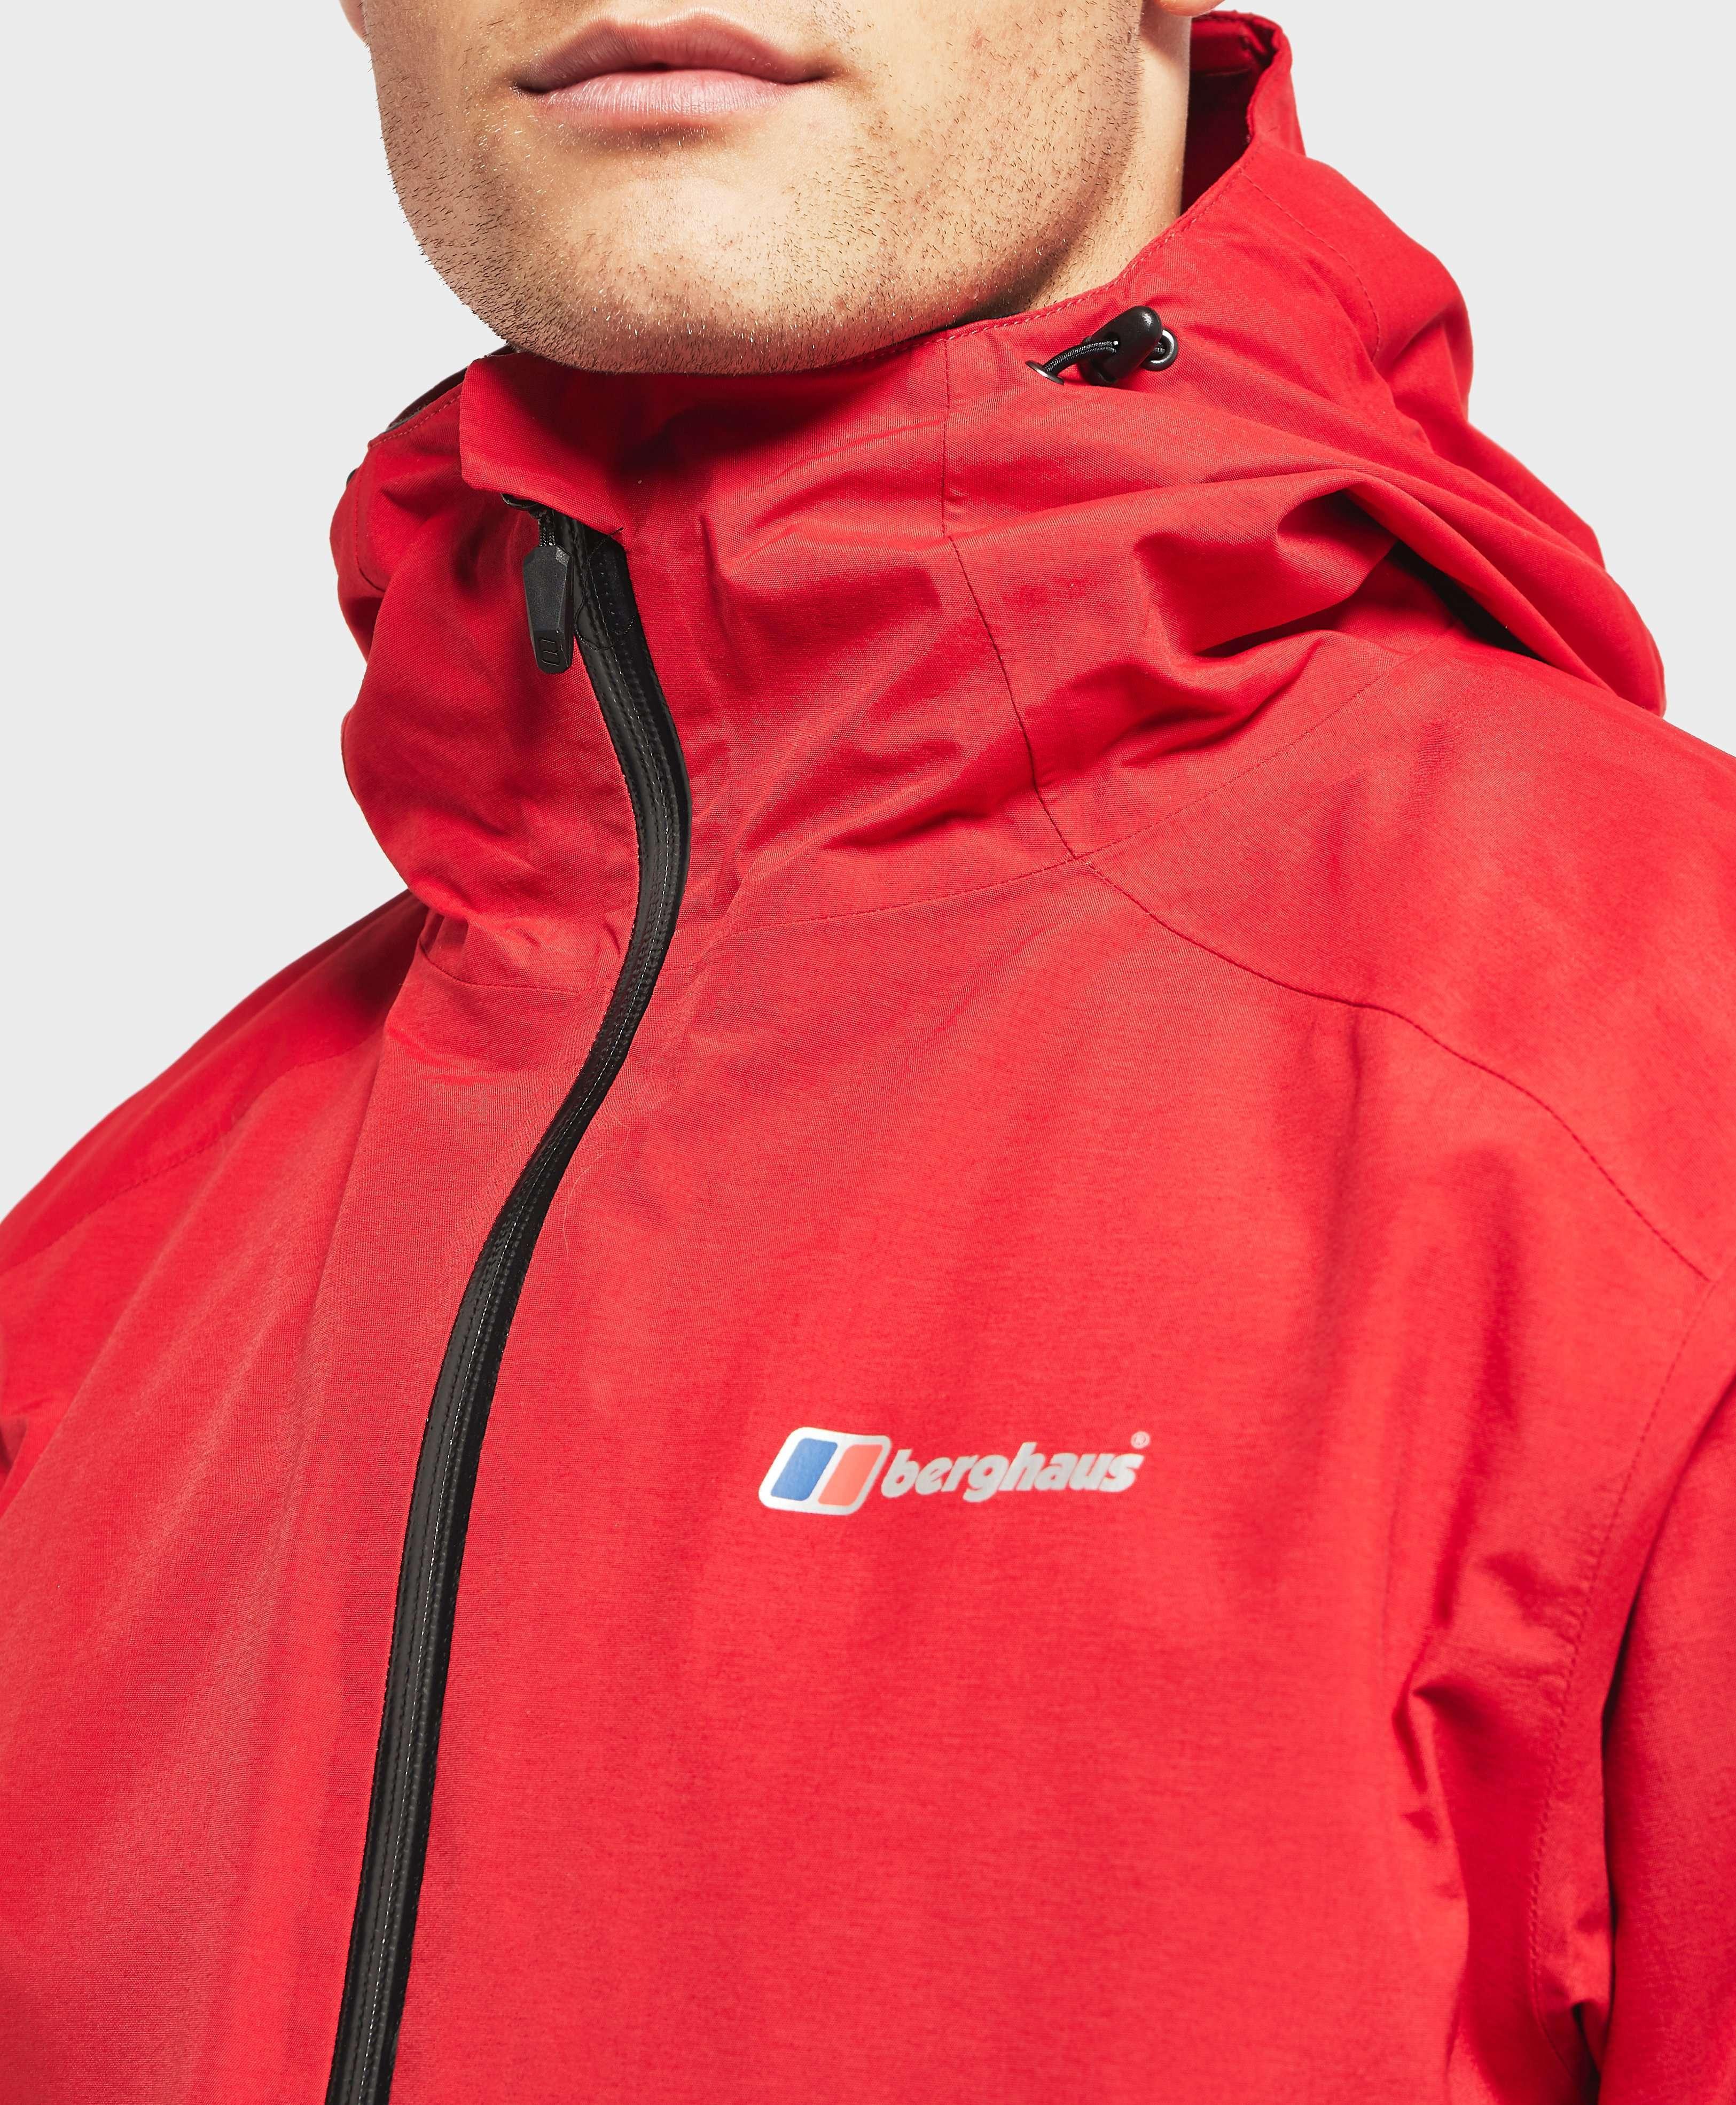 Berghaus Ridgemaster 3 In 1 Gore-Tex Lightweight Jacket